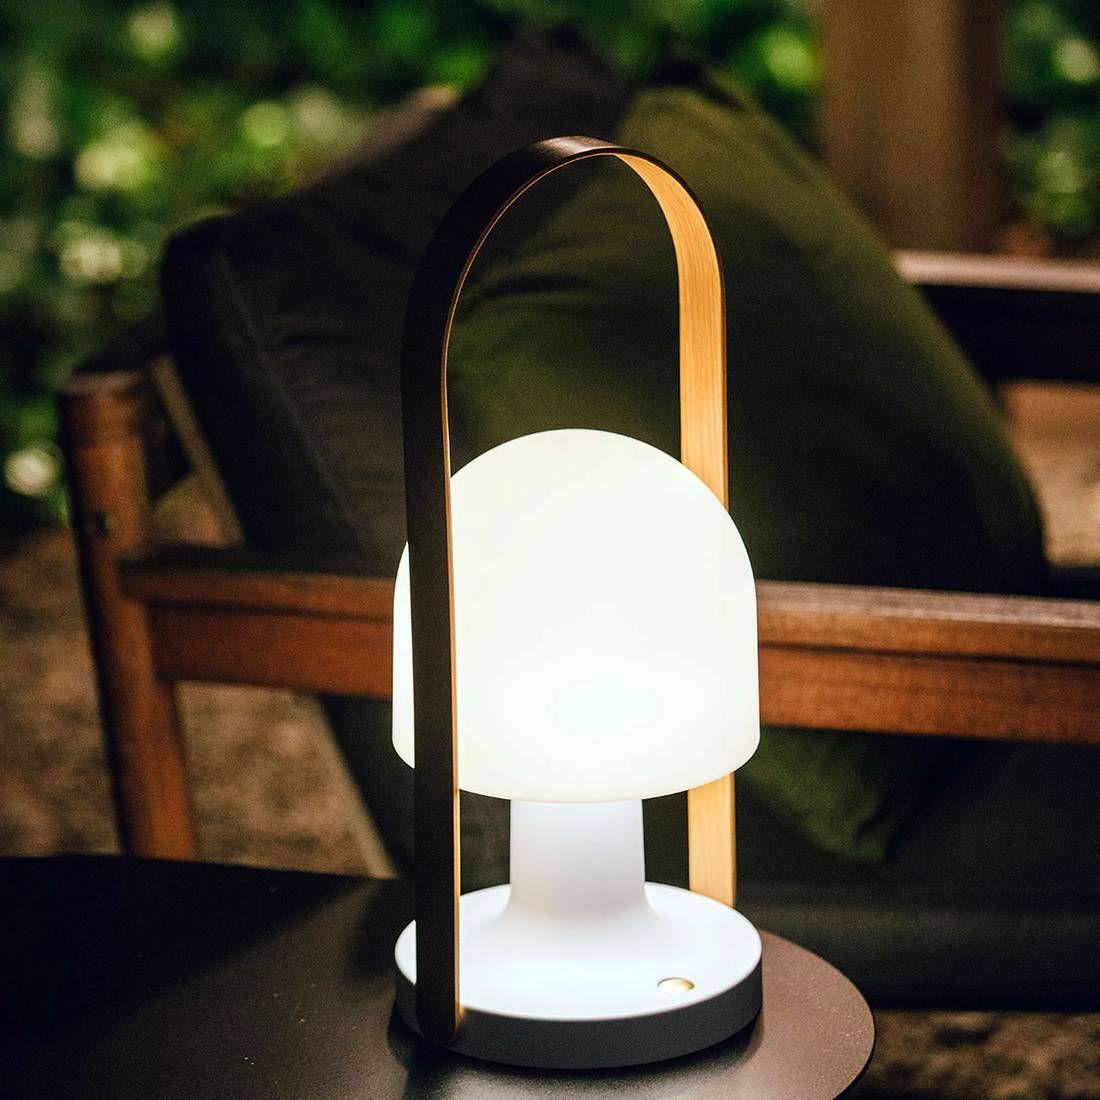 Lampe Baladeuse Led Rechargeable Chene Blanc H44 3cm Follow Me